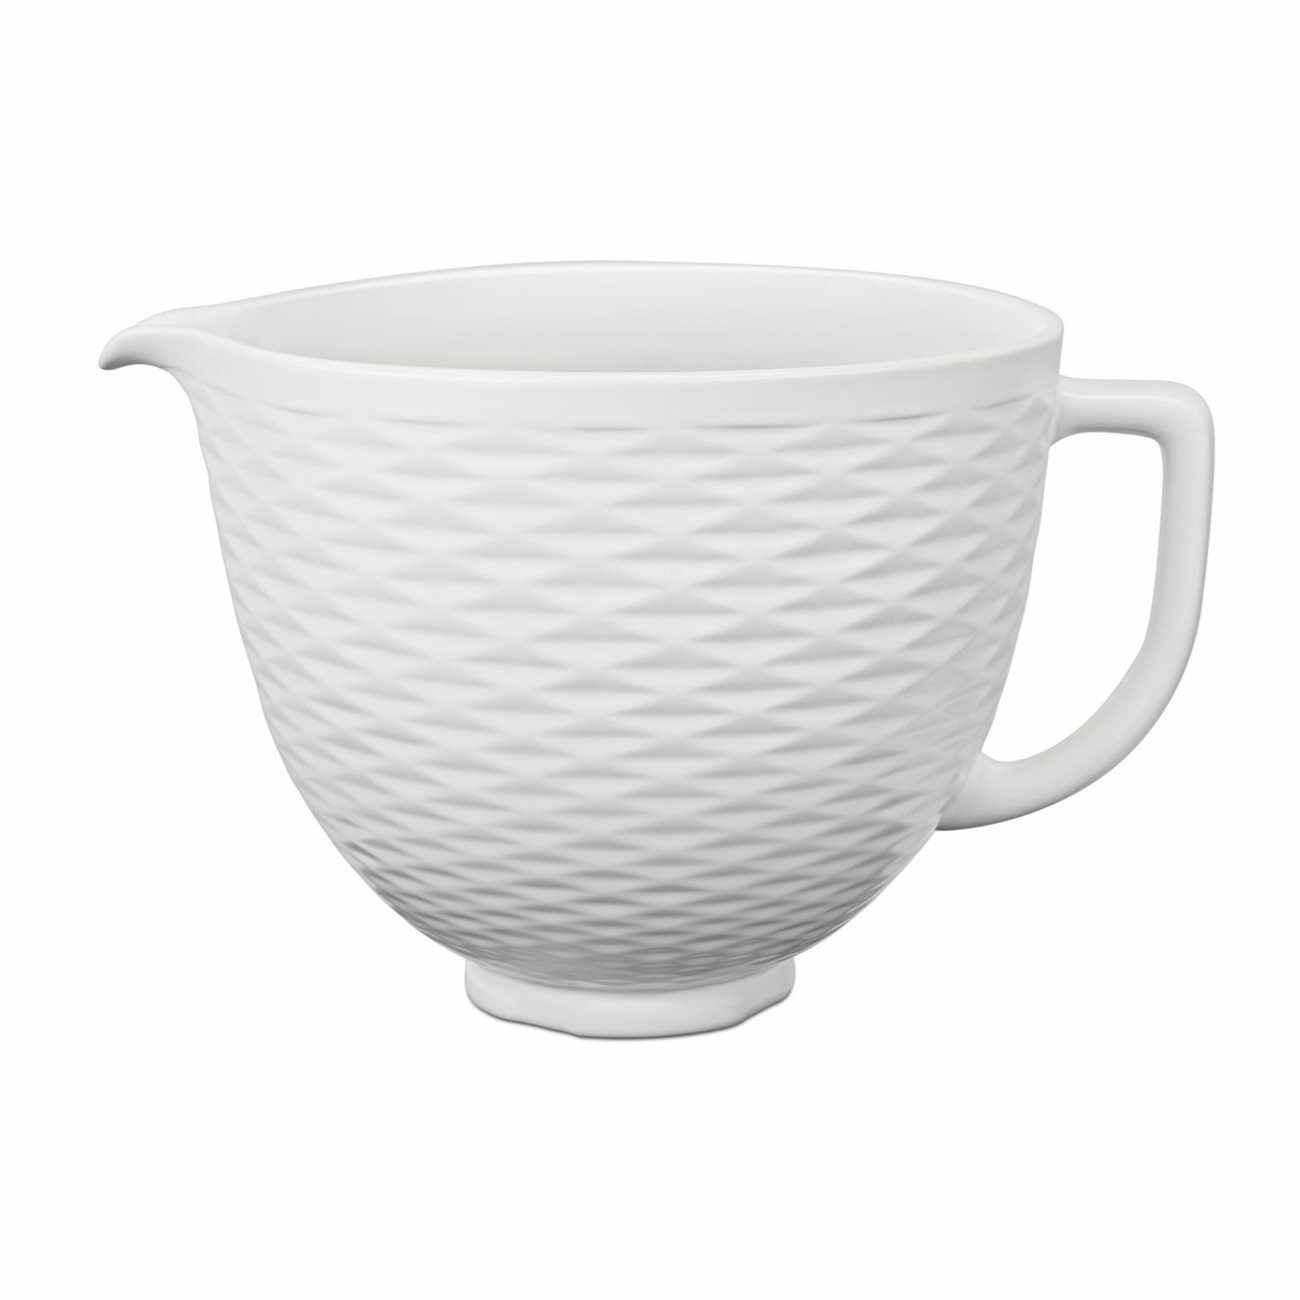 Bol din ceramica 5KSM2CB5TLW, 4,8 L, White, KitchenAid la pret 455 lei